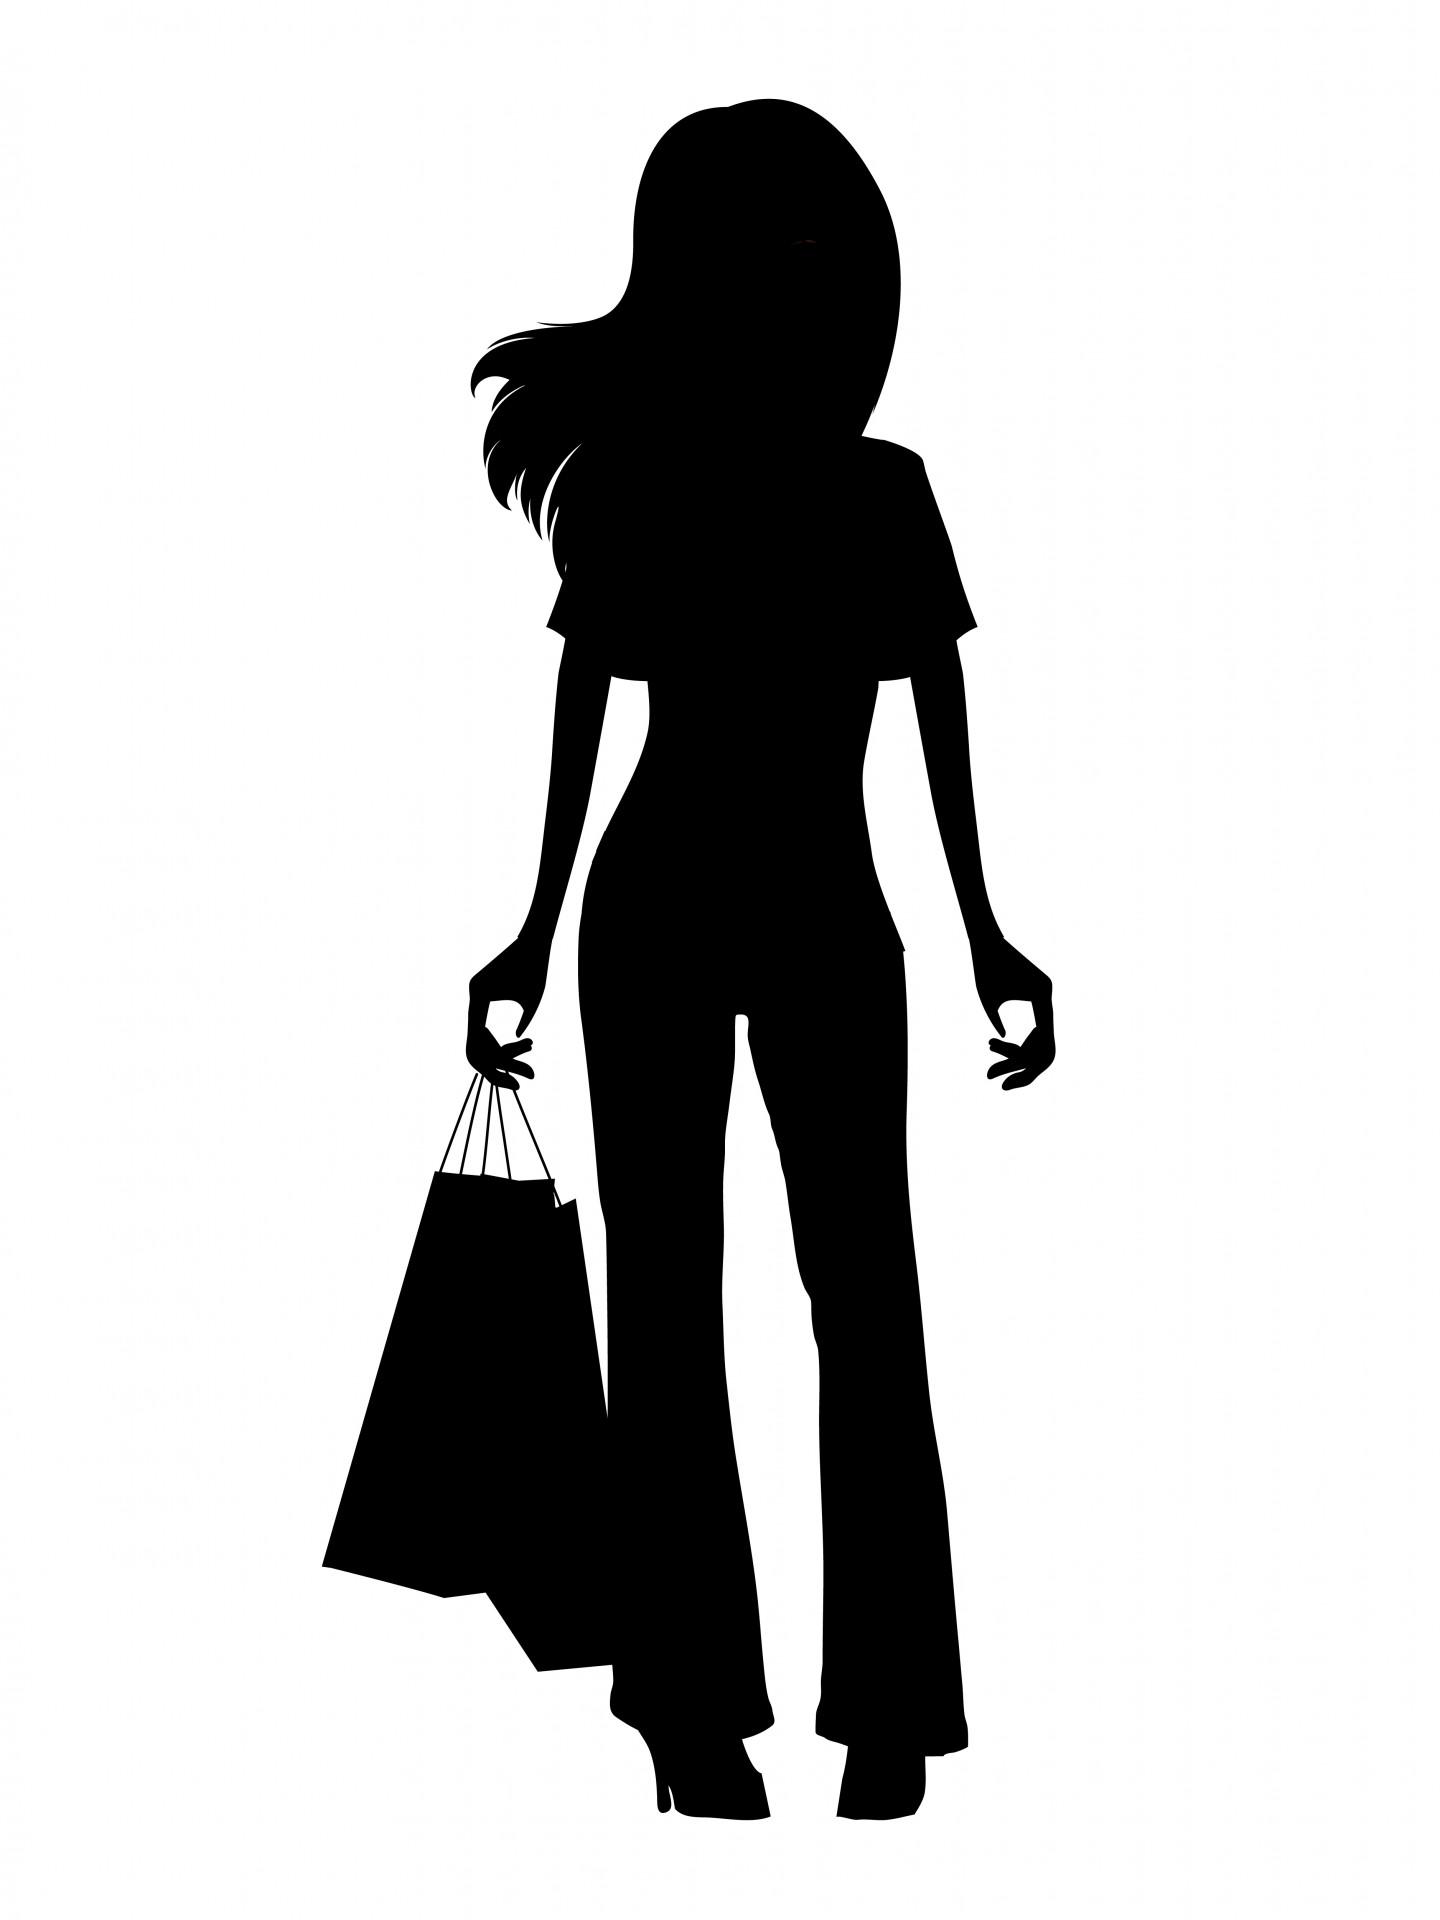 1440x1920 Girl Shopping Black Silhouette Free Stock Photo